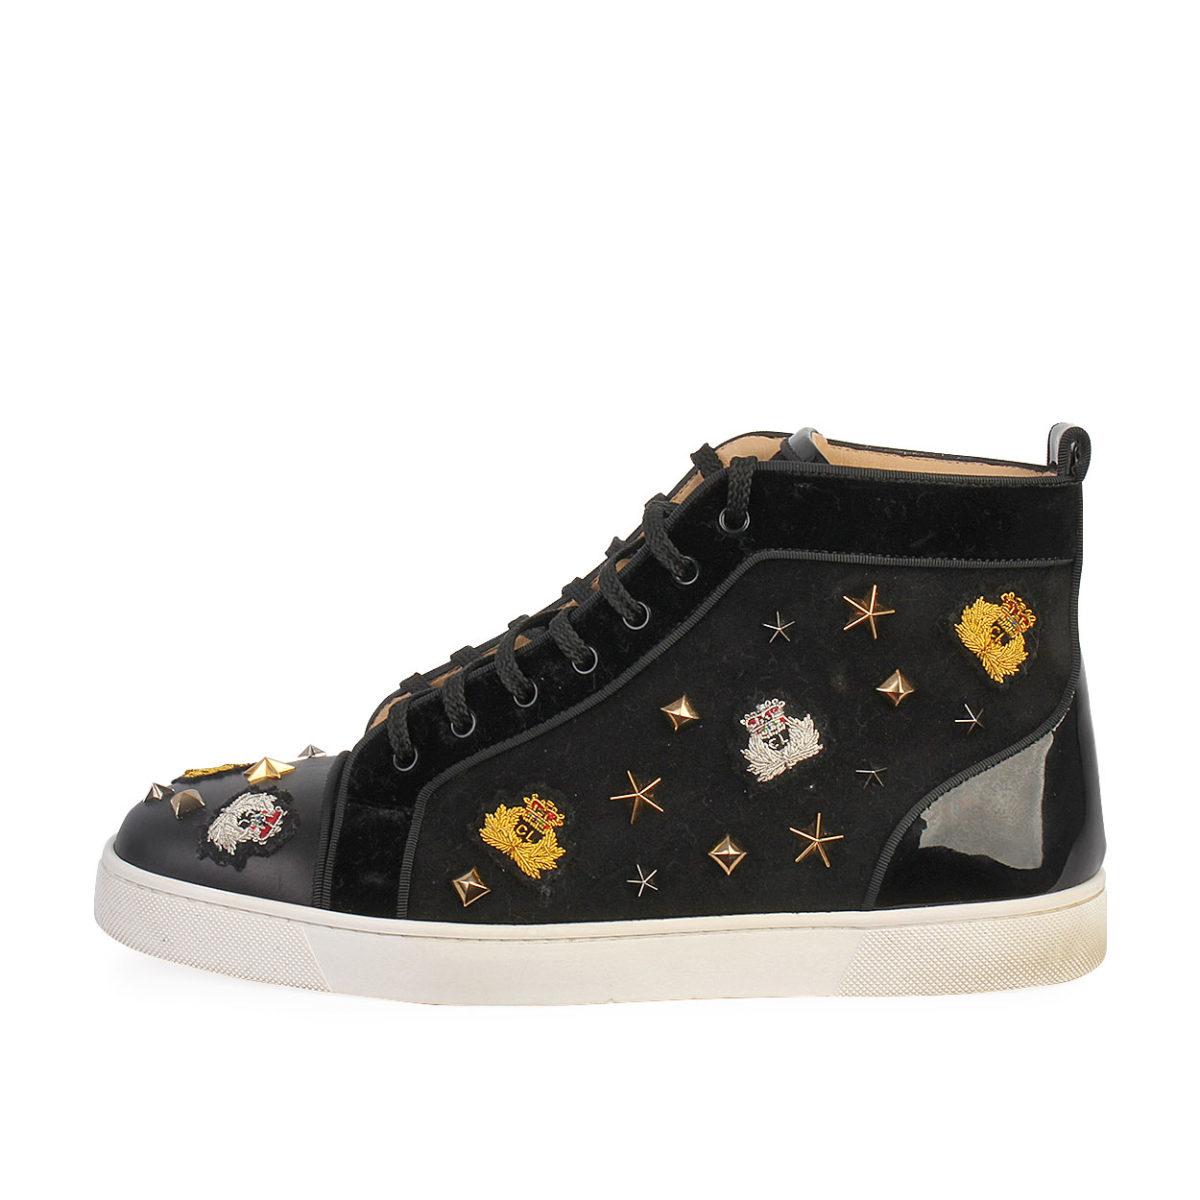 san francisco 3c904 e1e37 CHRISTIAN LOUBOUTIN Velvet/Leather Studded Crest High Top Sneakers Black -  S: 43.5 (9)